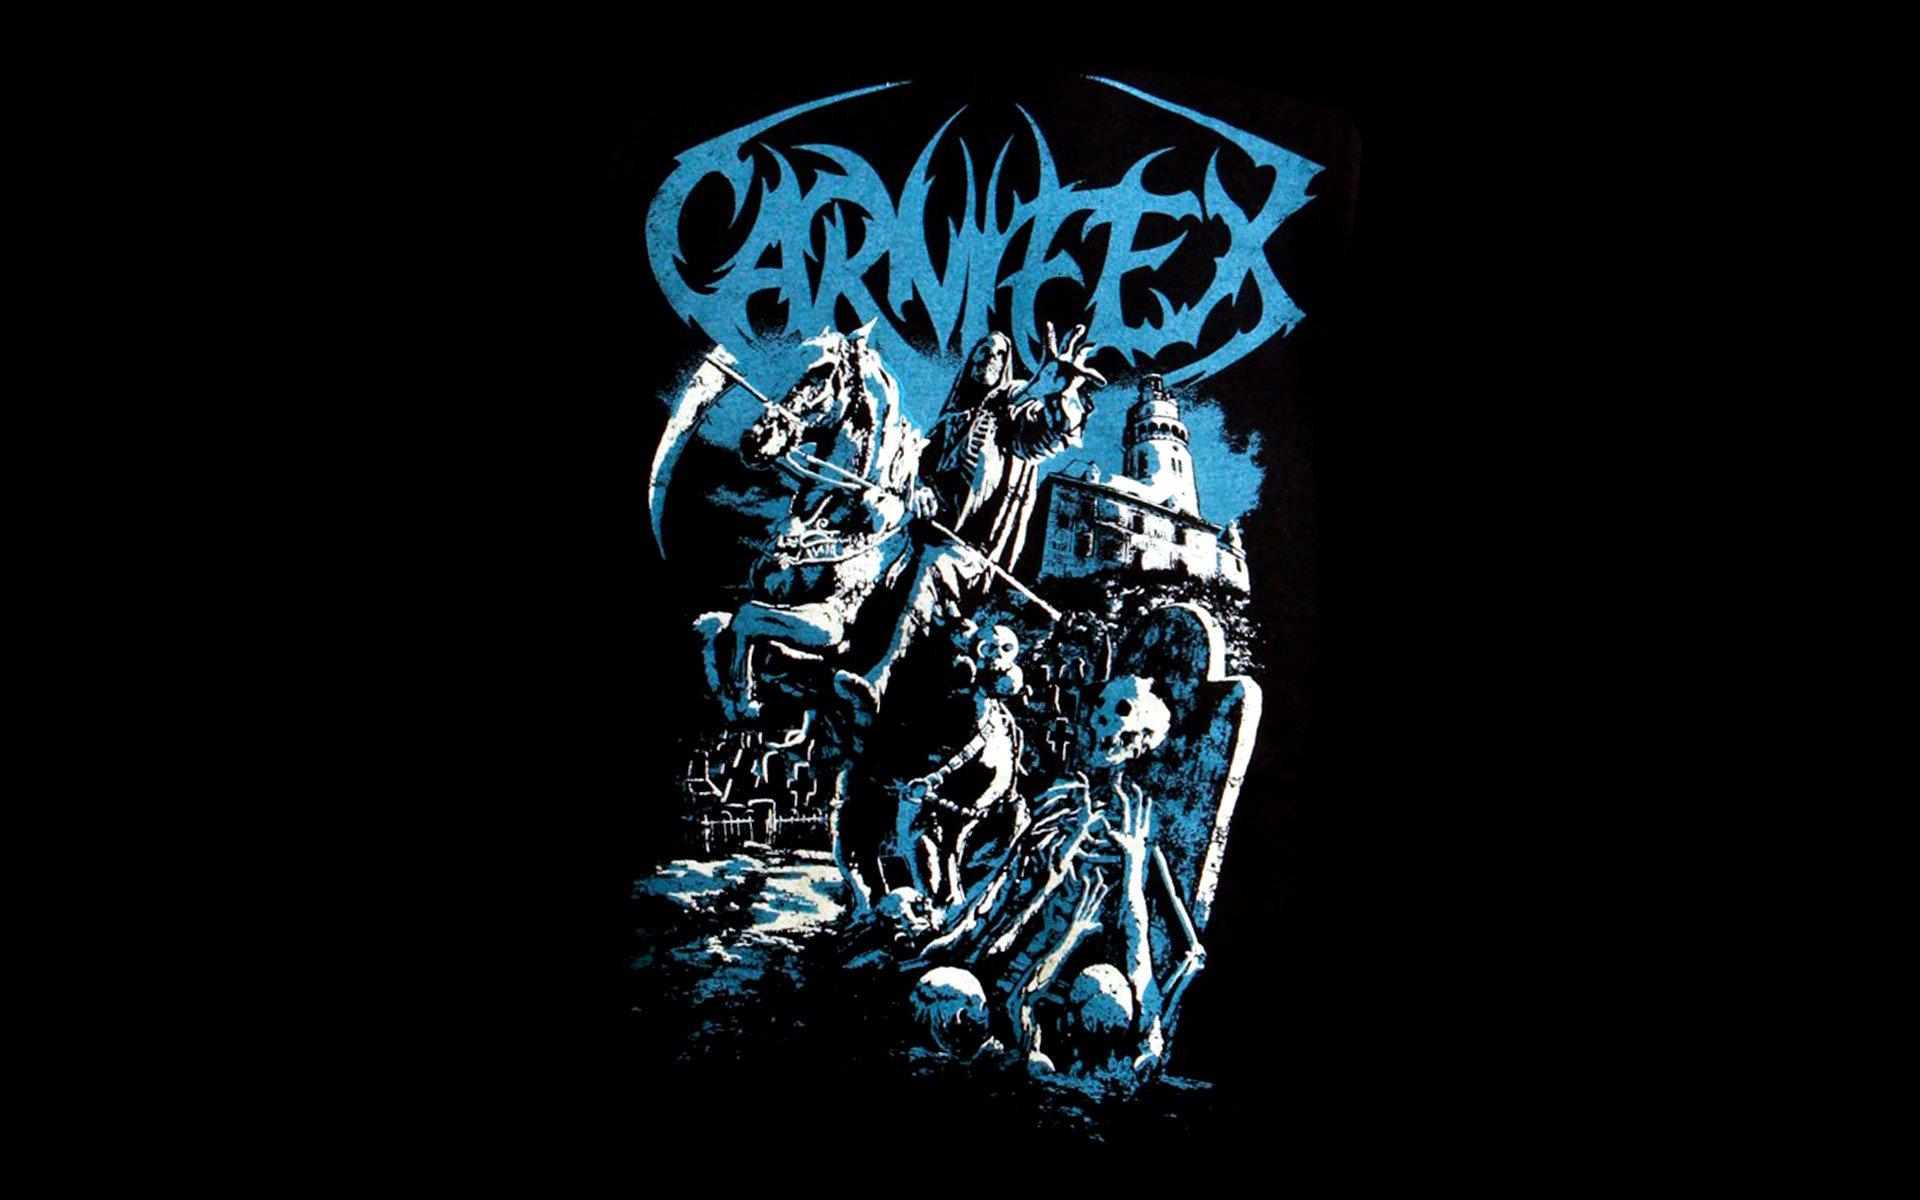 1920x1200 px 1carn carnifex dark death deathcore evil heavy metal poster reaper skull symphonic